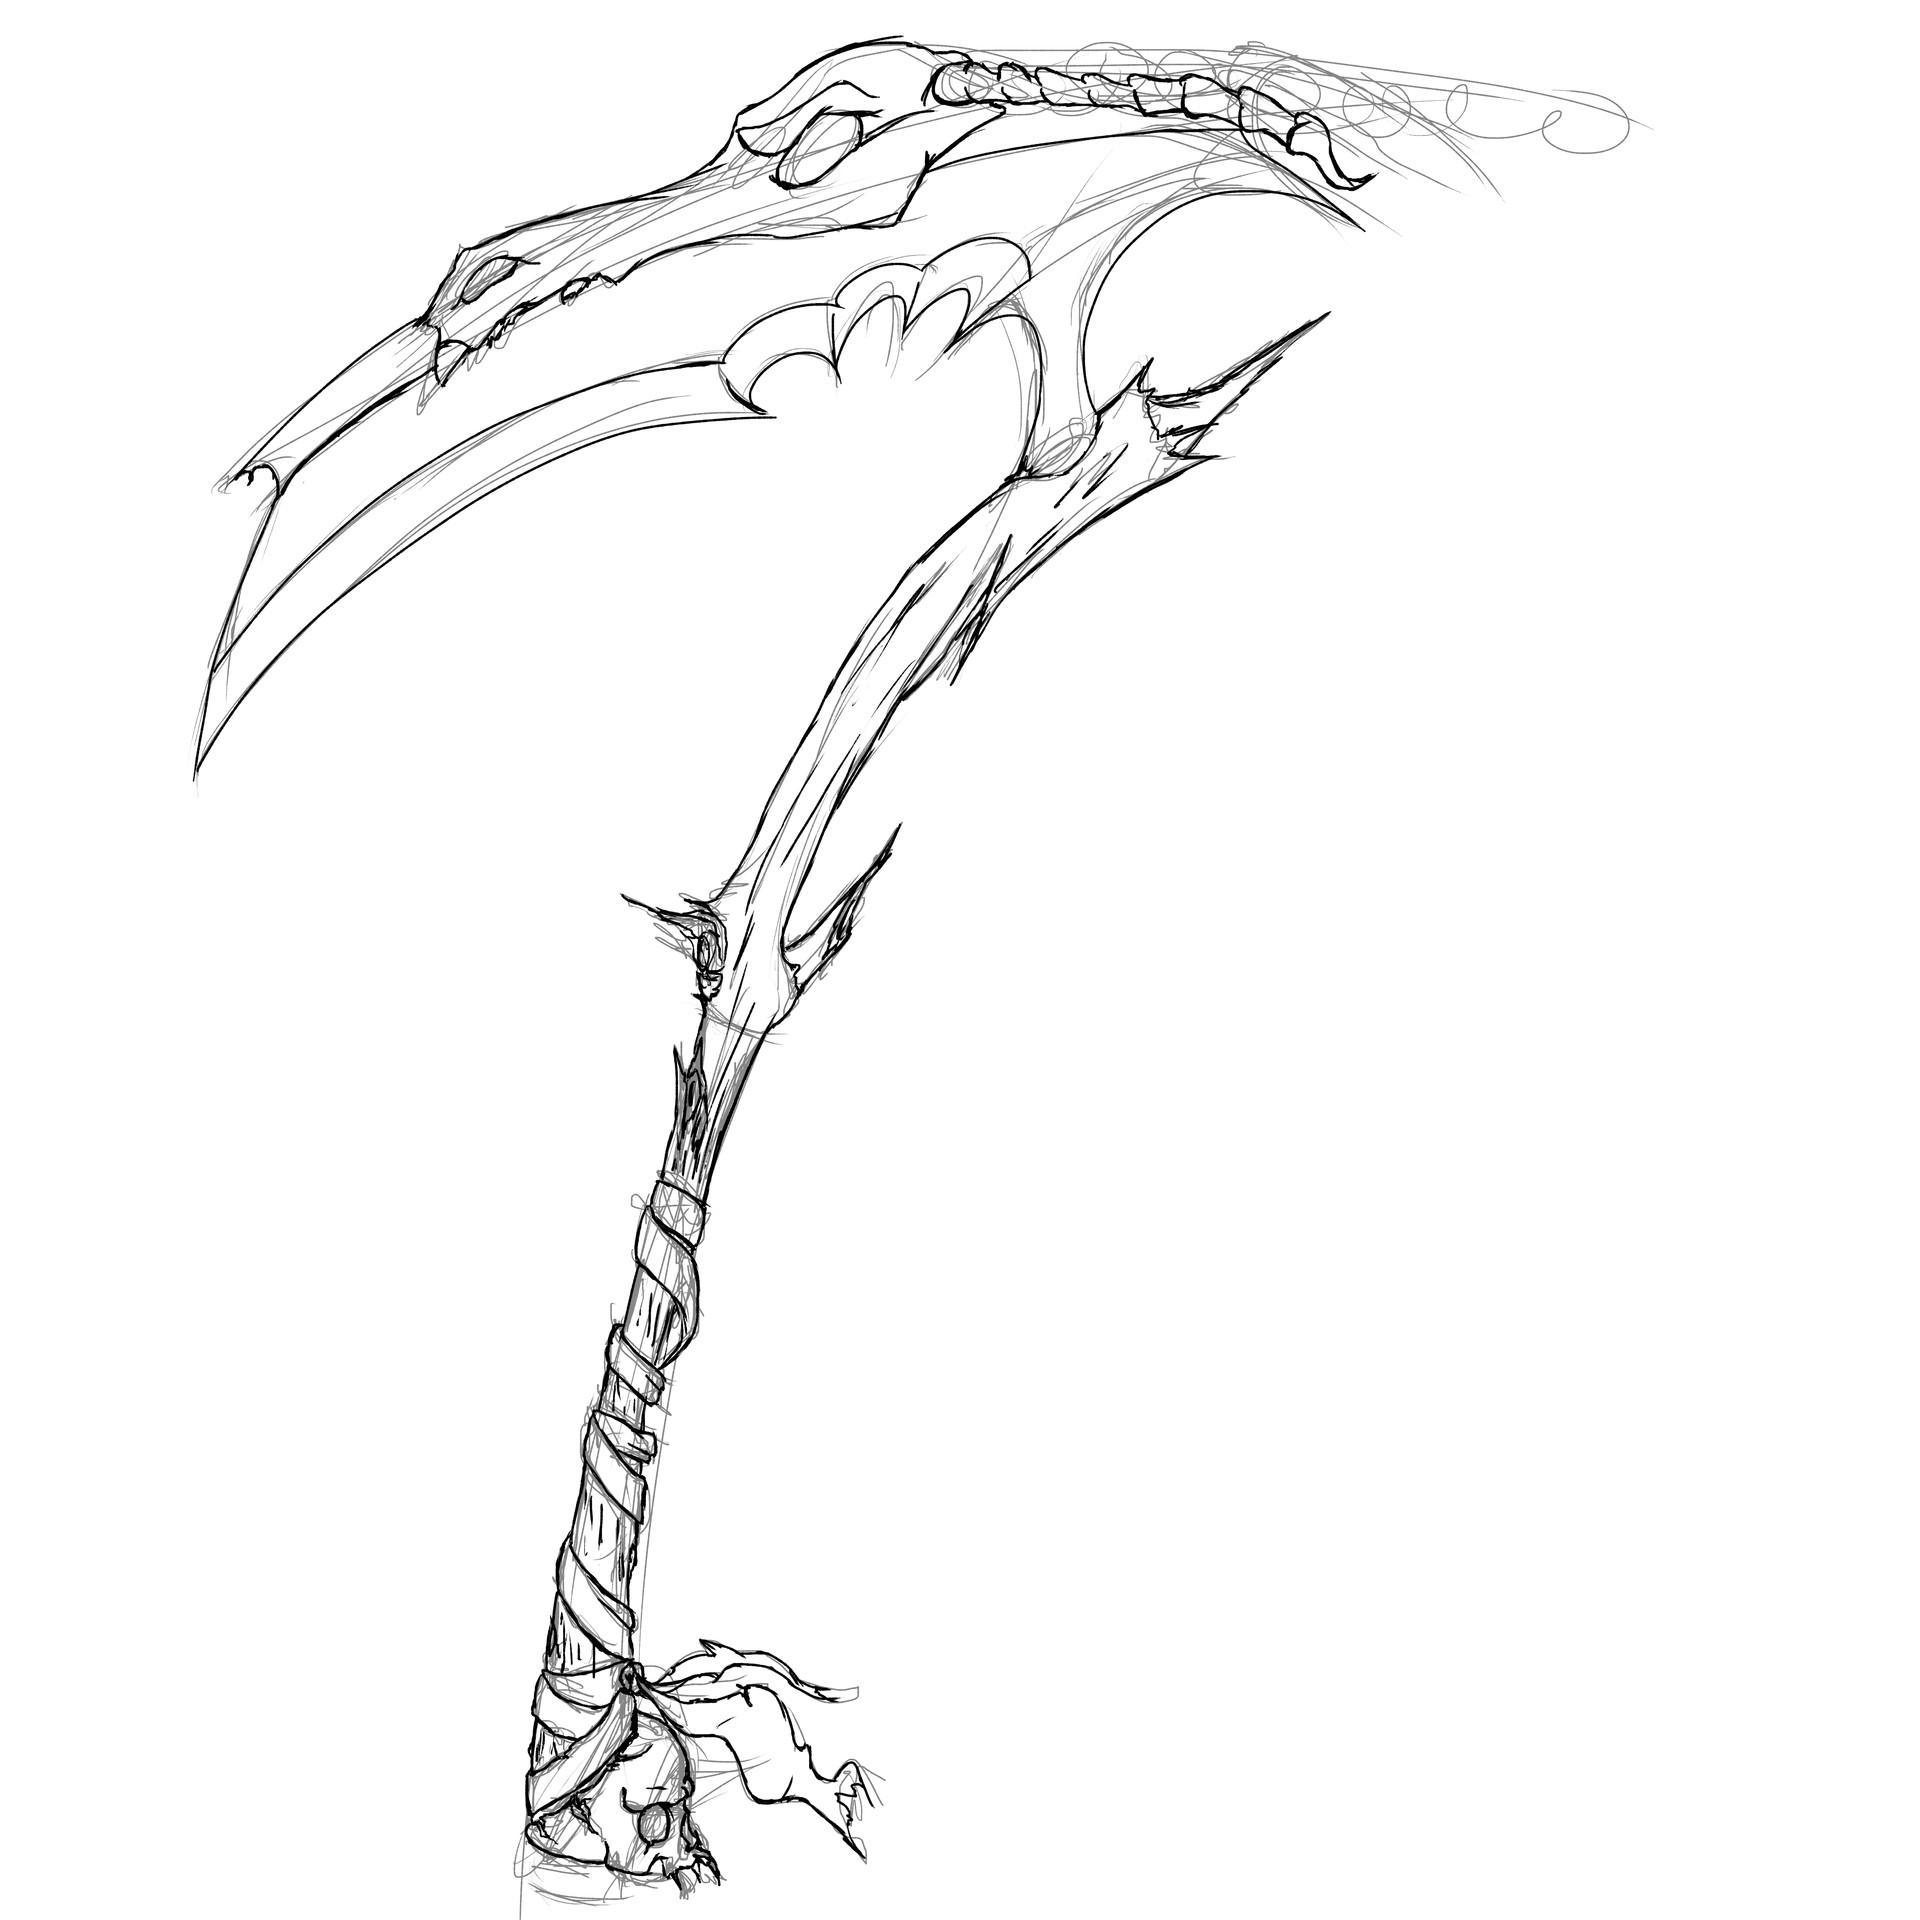 Drawn scythe demonic Scythe Demon Marius Scythe Demon